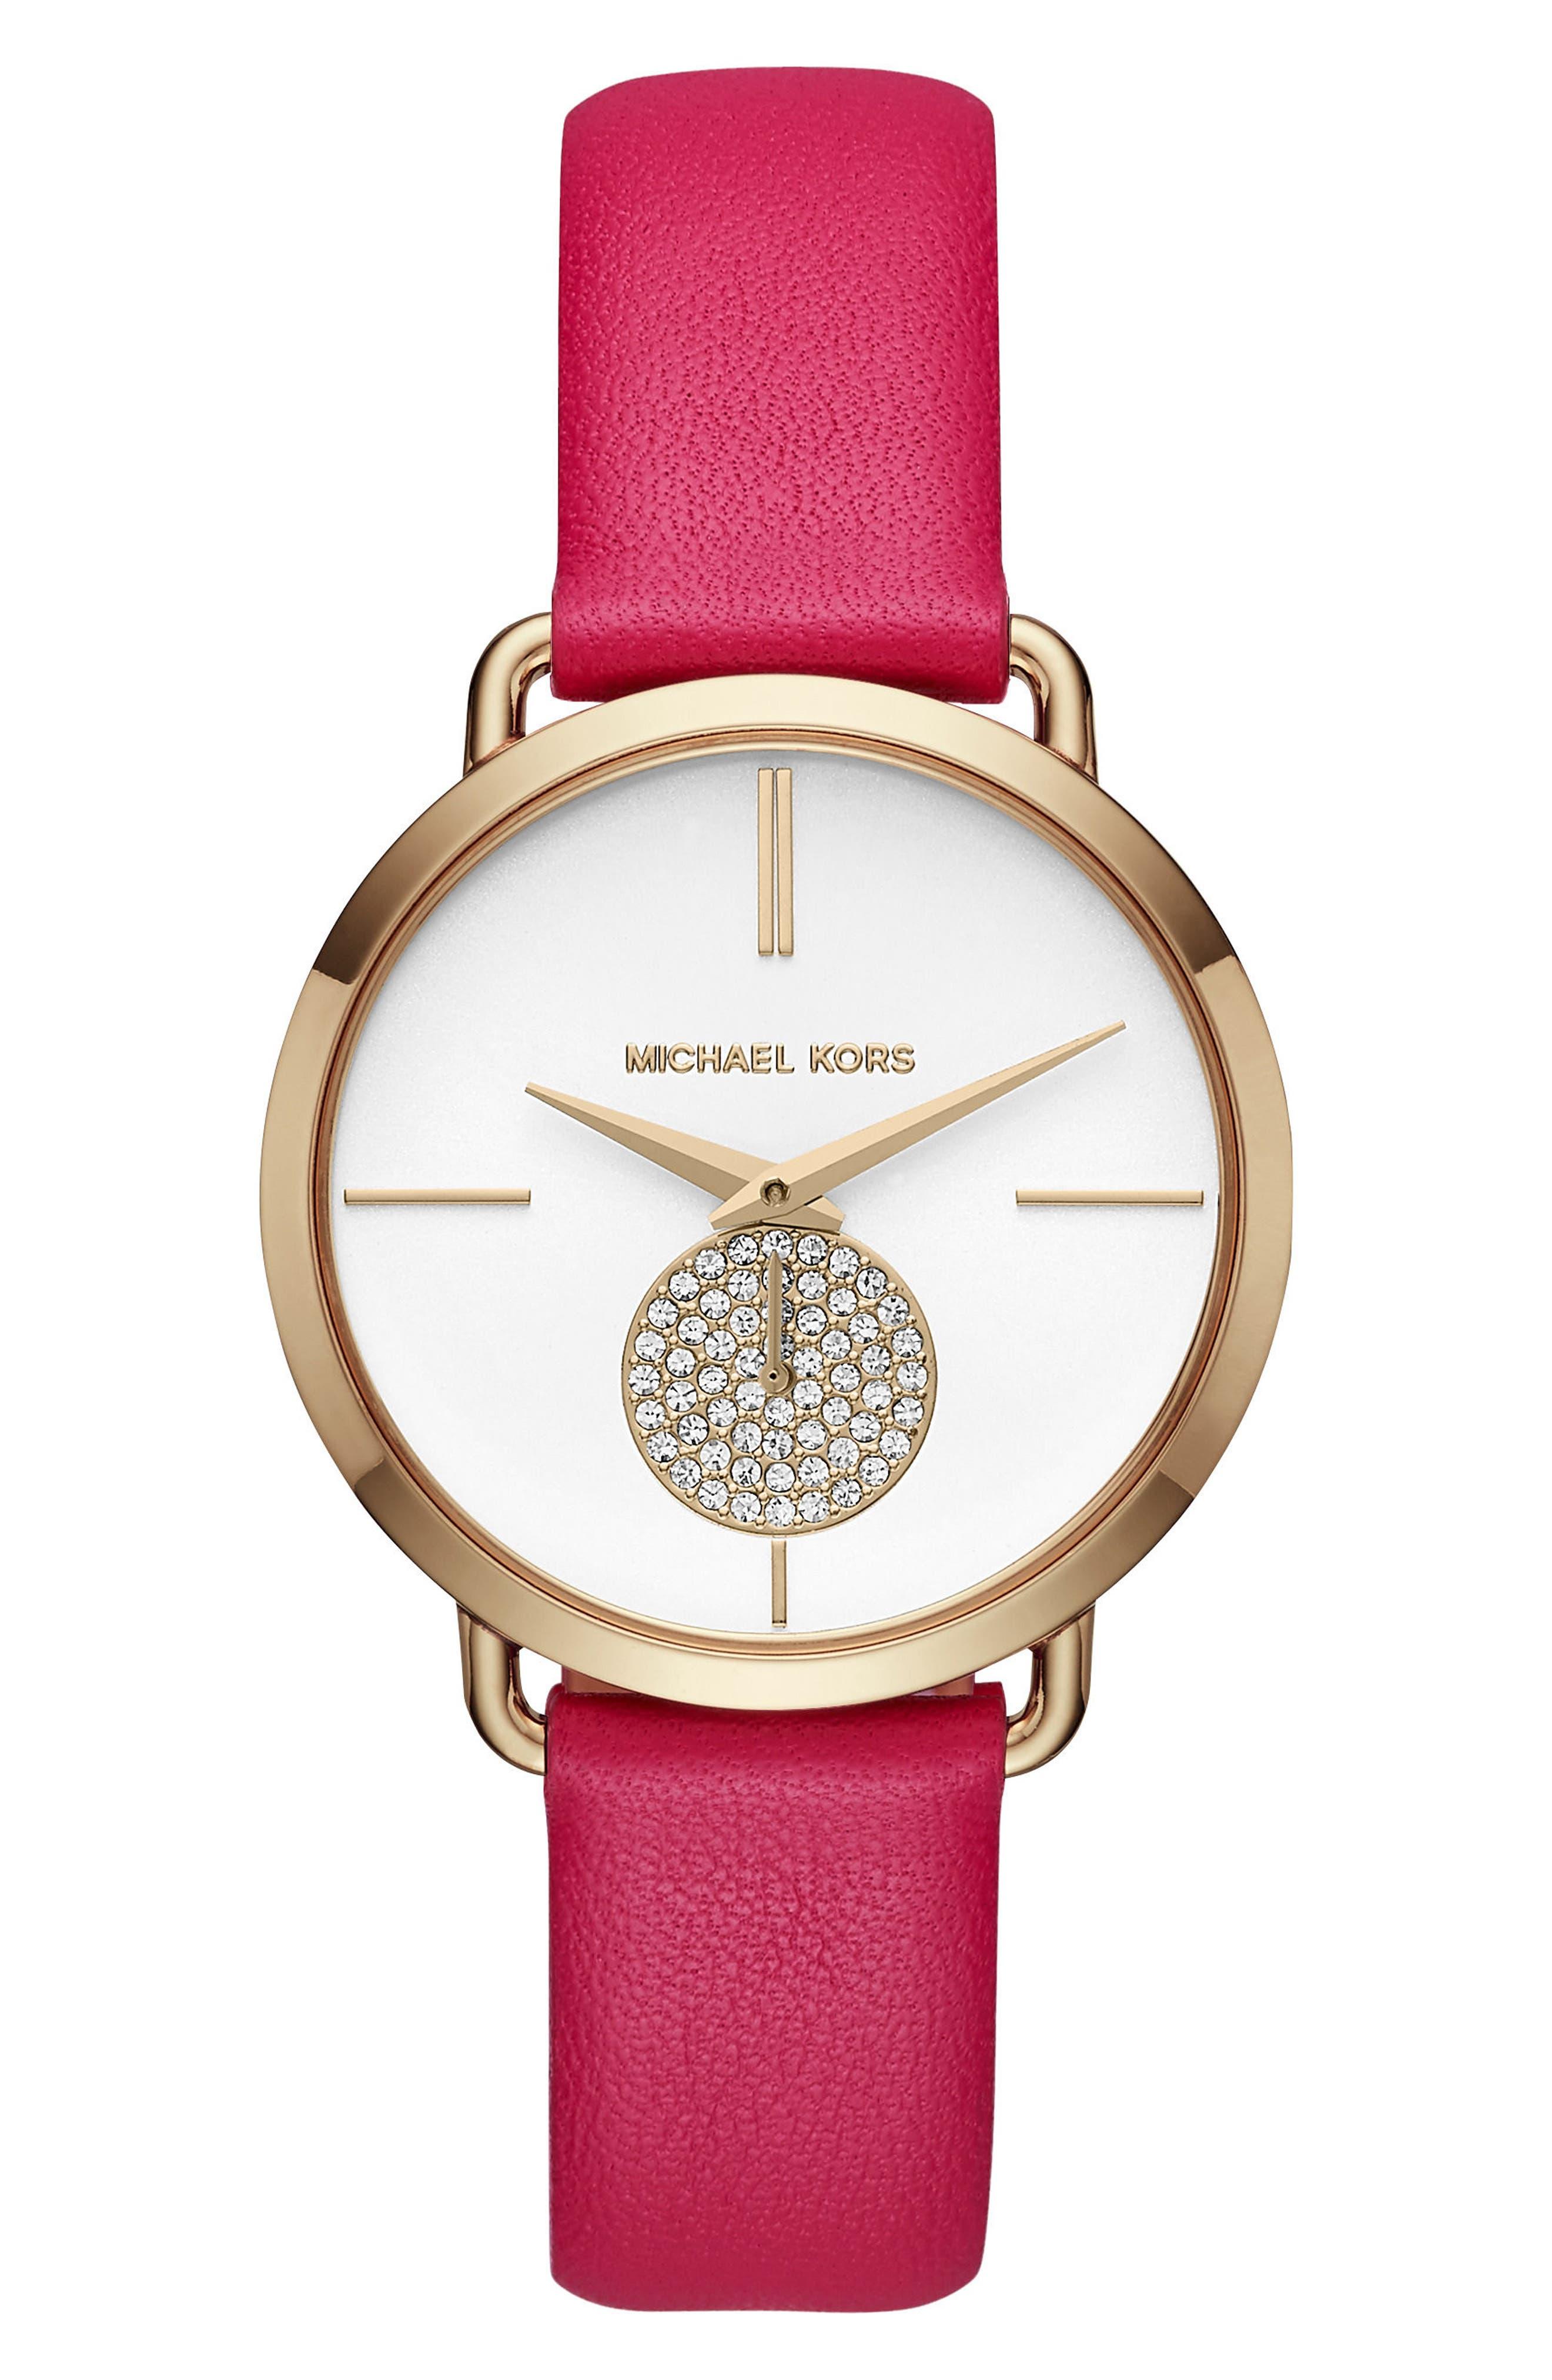 Michael Kors Portia Leather Strap Watch, 36mm